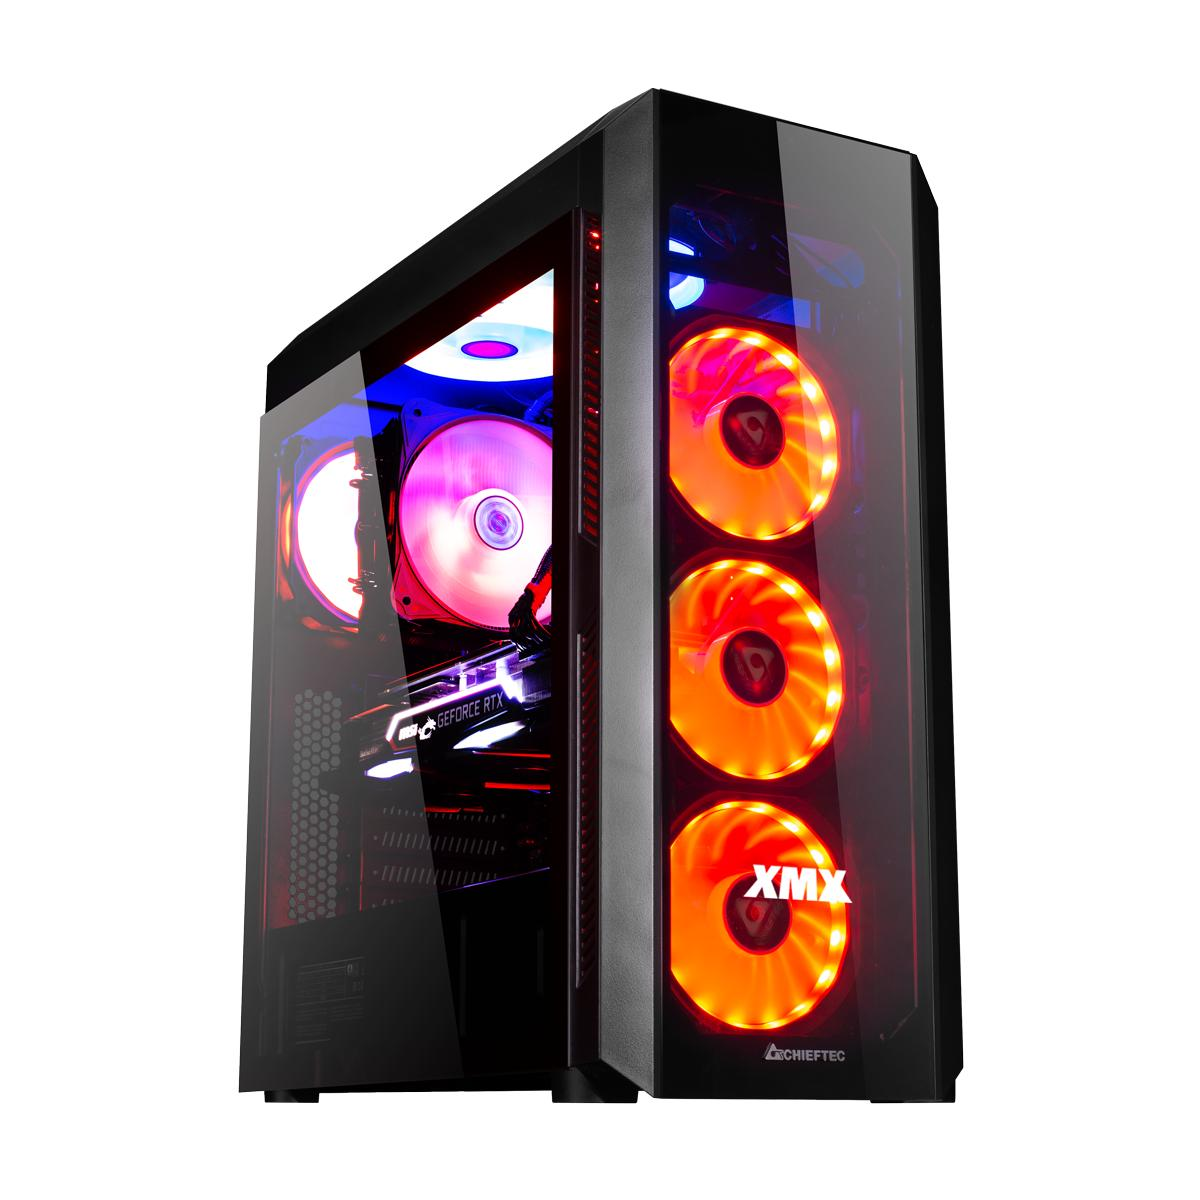 XMX Intel Computer, Hauptbild (15.01.2021)